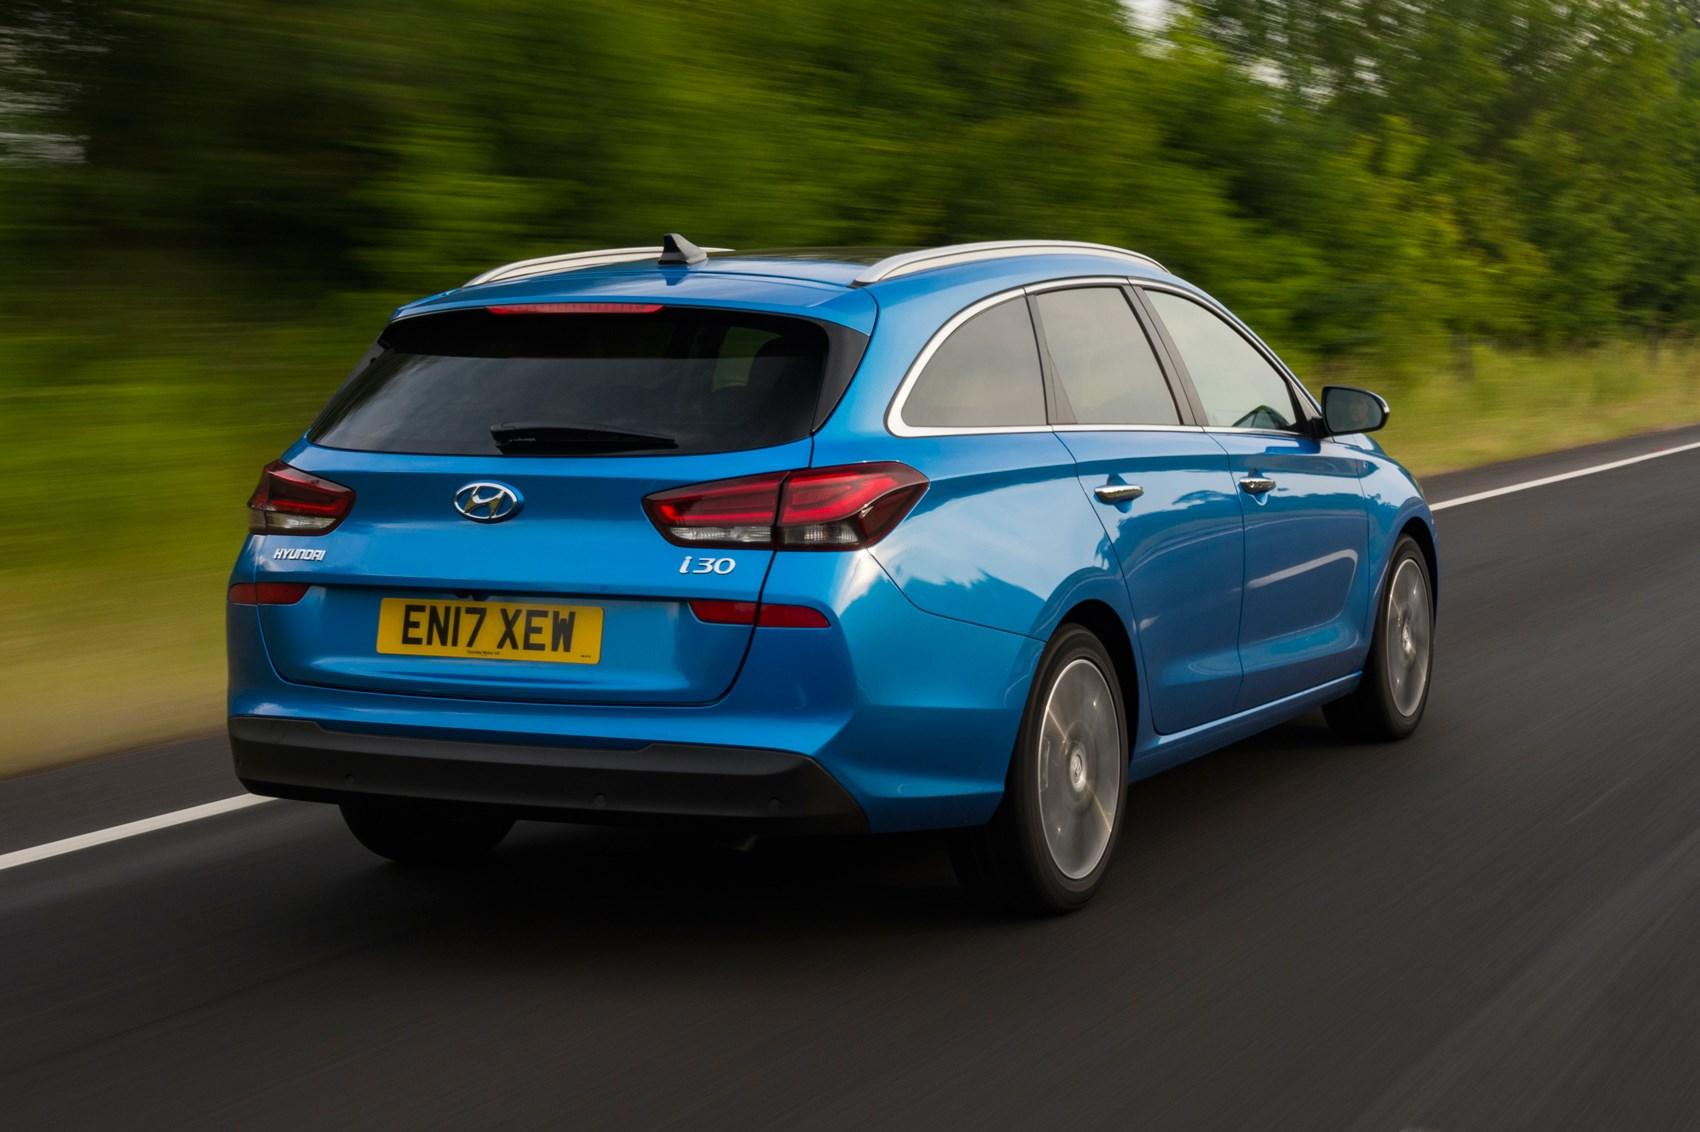 Hyundai i30 Tourer estate (2018) review: giving it a boot full | CAR